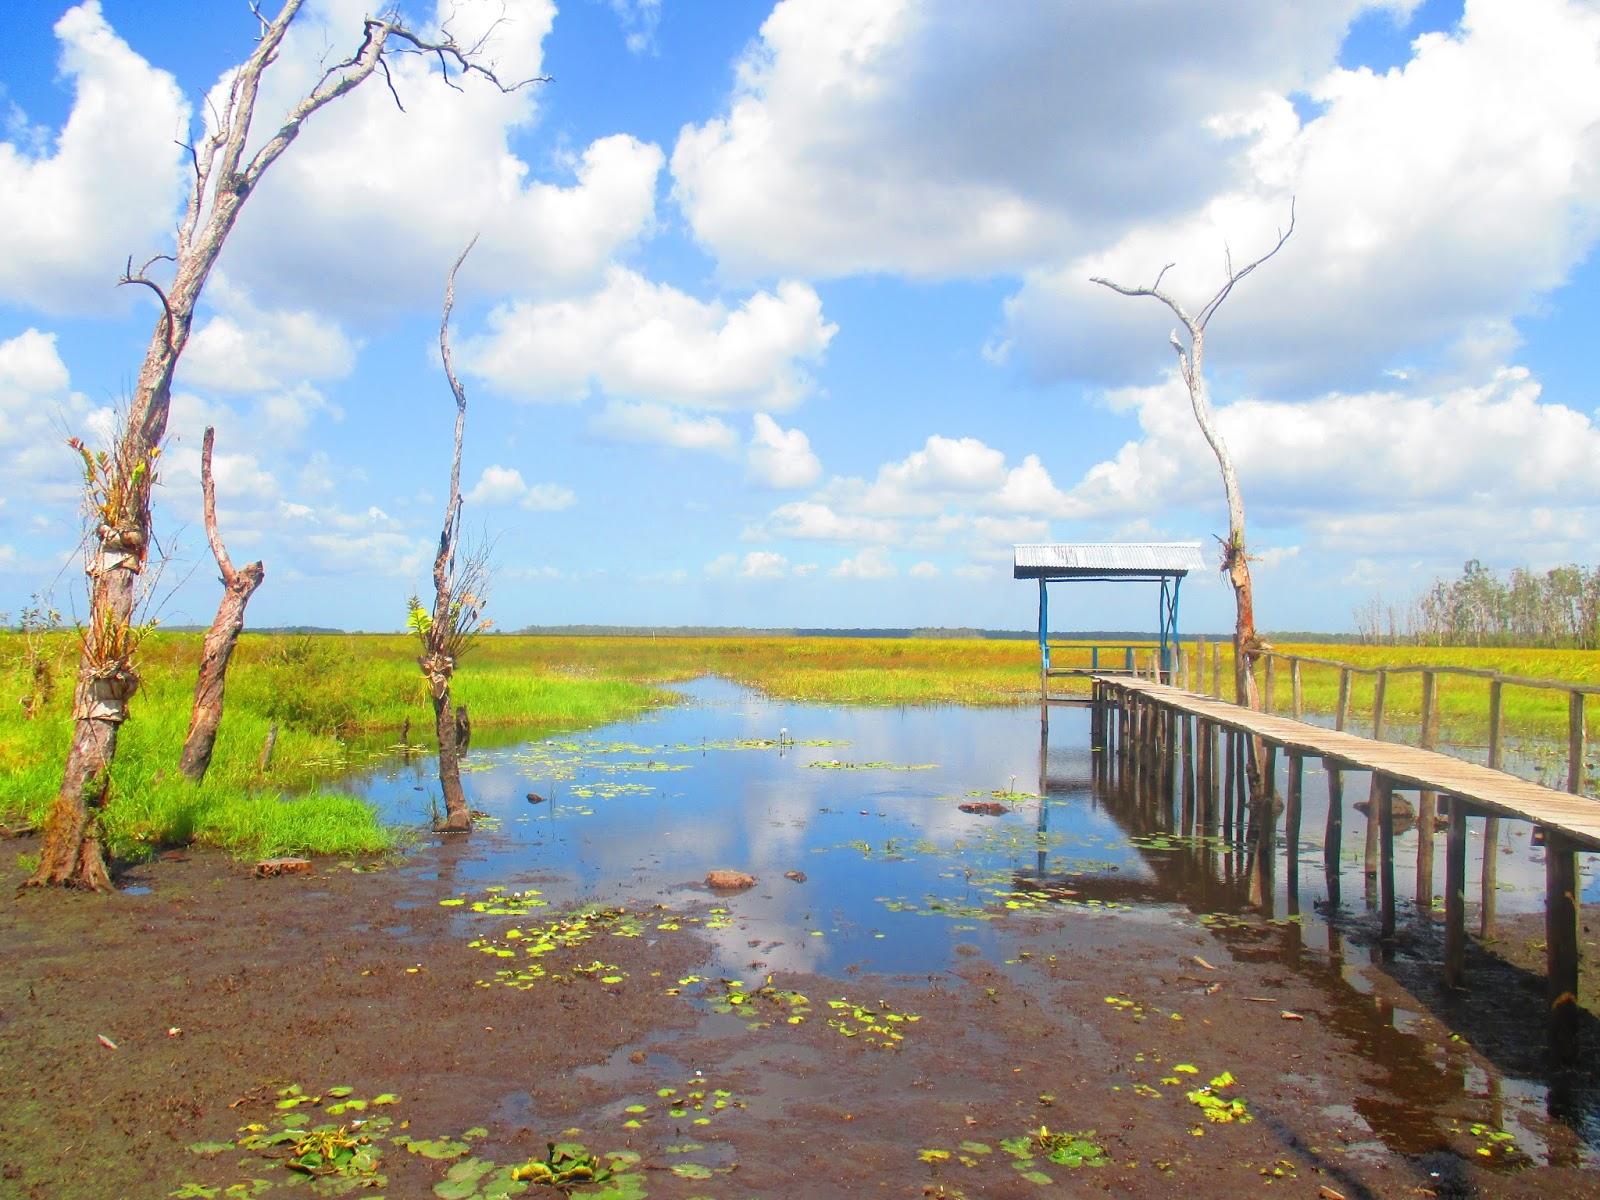 Destinasi wisata di Merauke - Kampung Rawa Biru